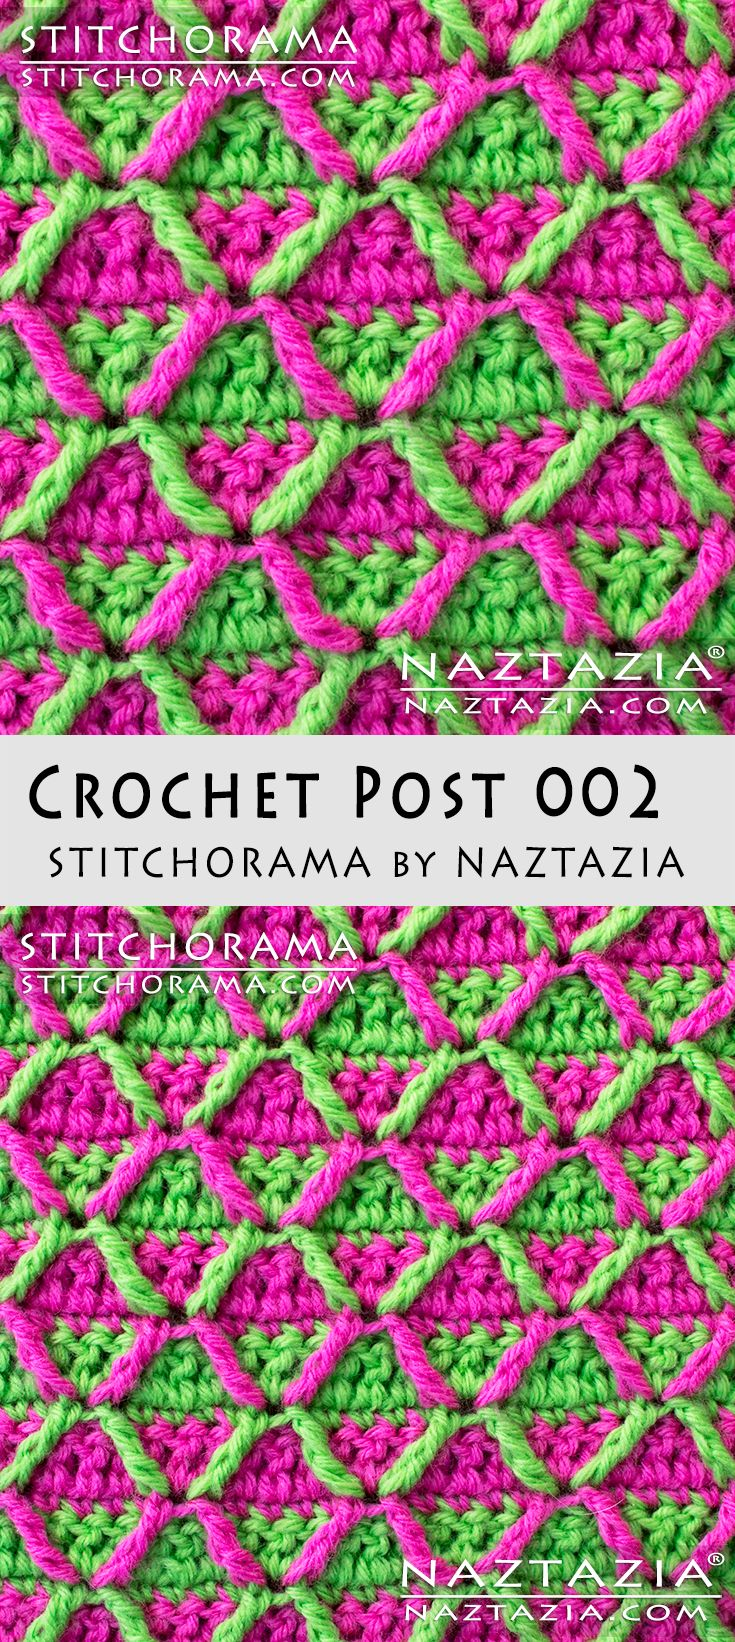 Crochet Post 002 Stitchorama by Naztazia Free Pattern & DIY Tutorial YouTube Video by Donna Wolfe